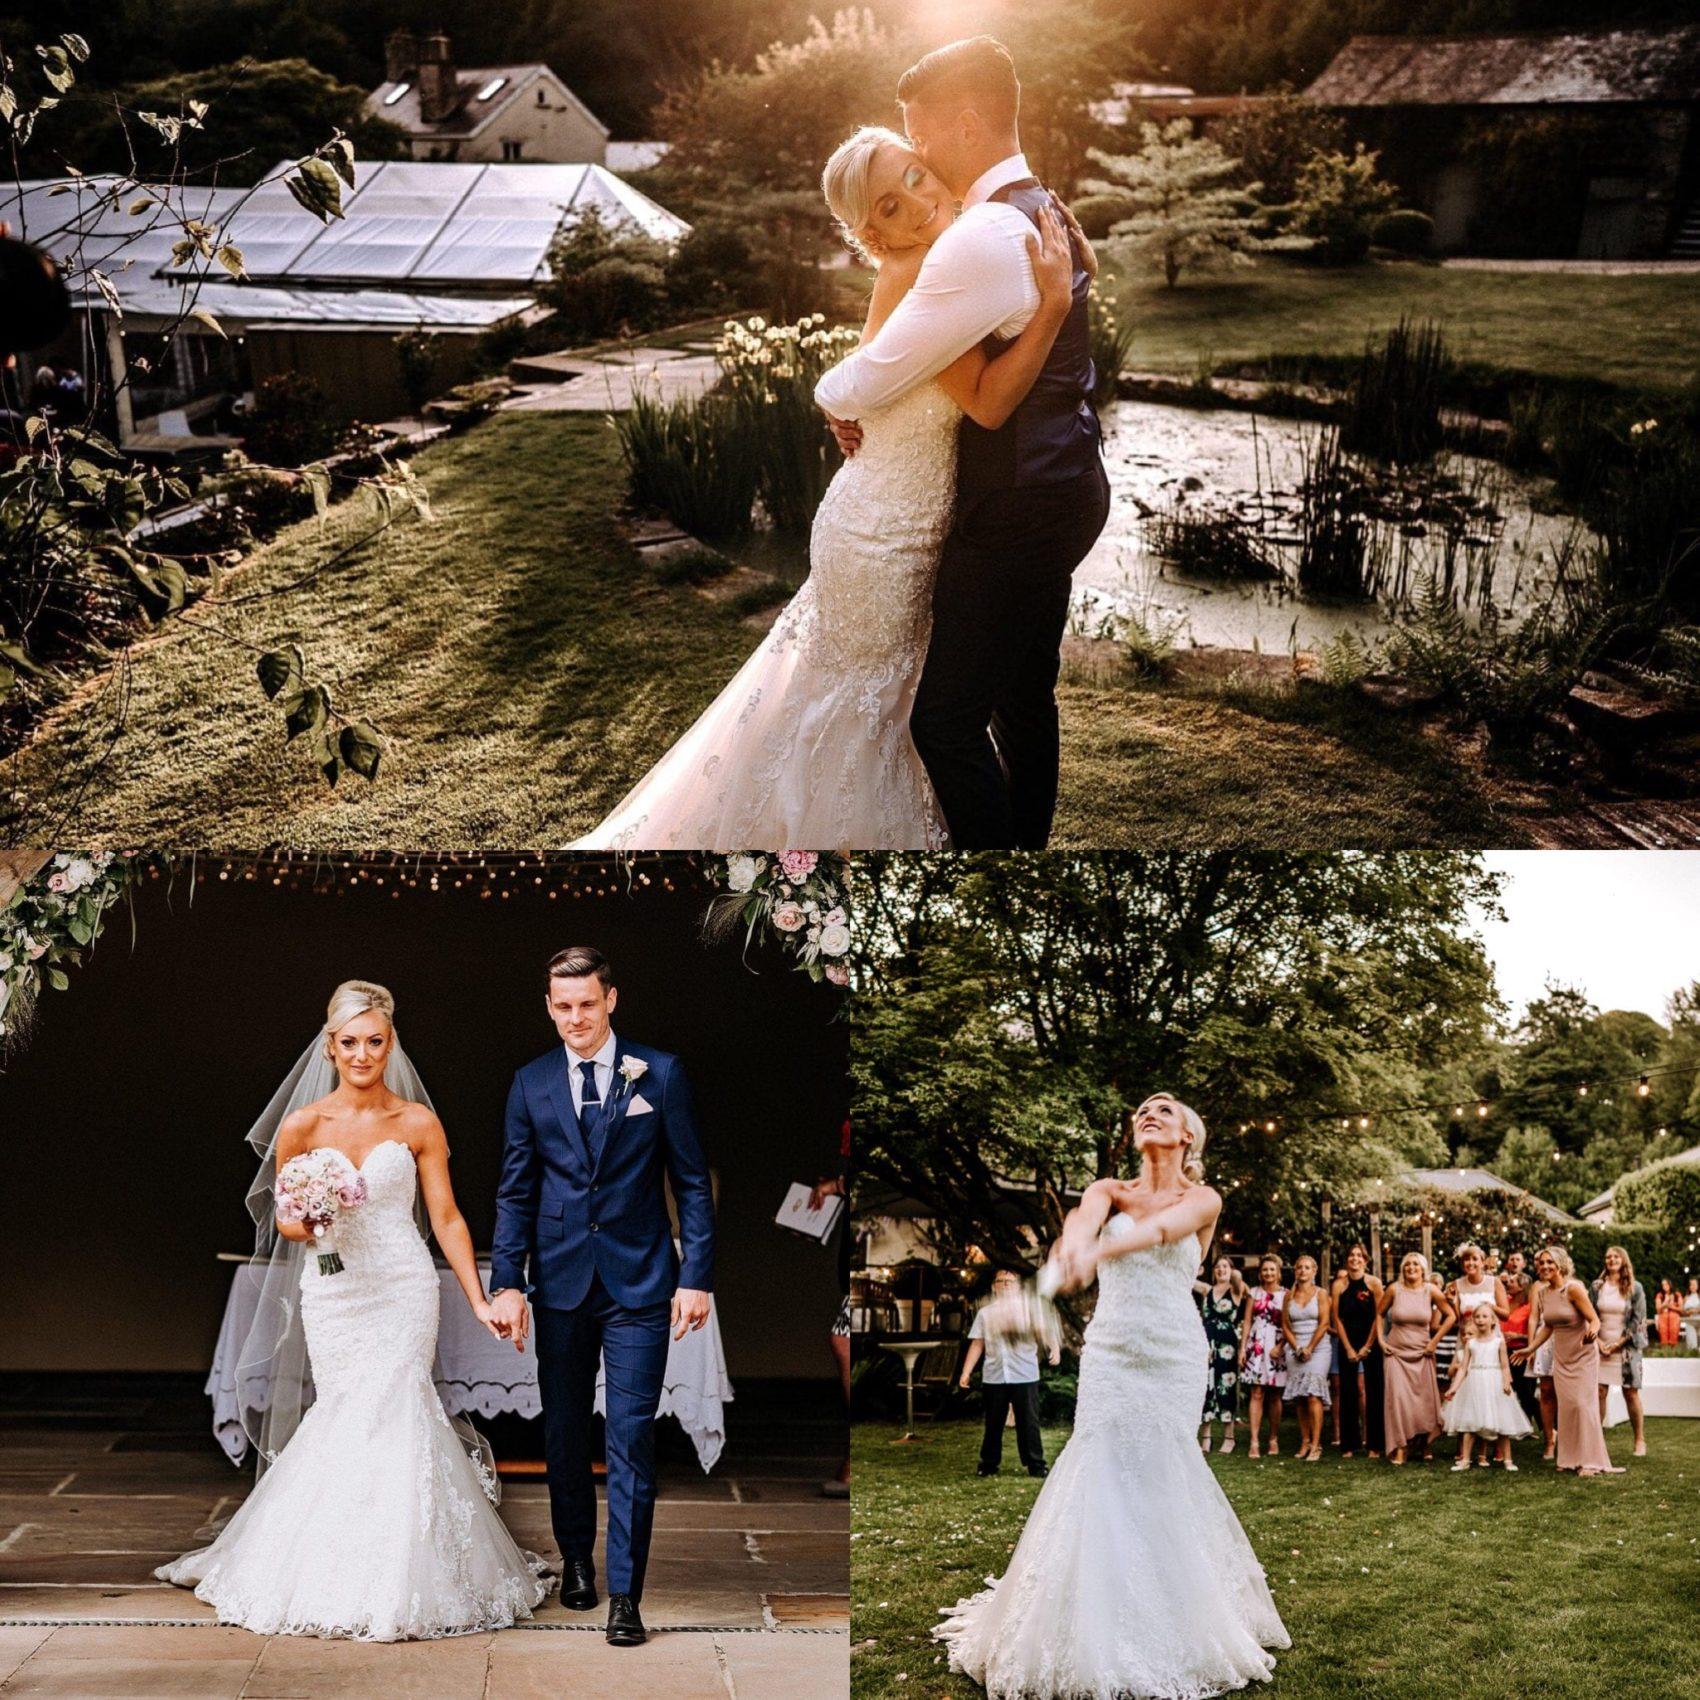 Couple, wedding, bridge & groom, pond, barn, flowers, bouquet toss, girls, ladies, guests, friends, veil, woodland, greenery, sunset, ever after, lower grenofen, dan ward, photography